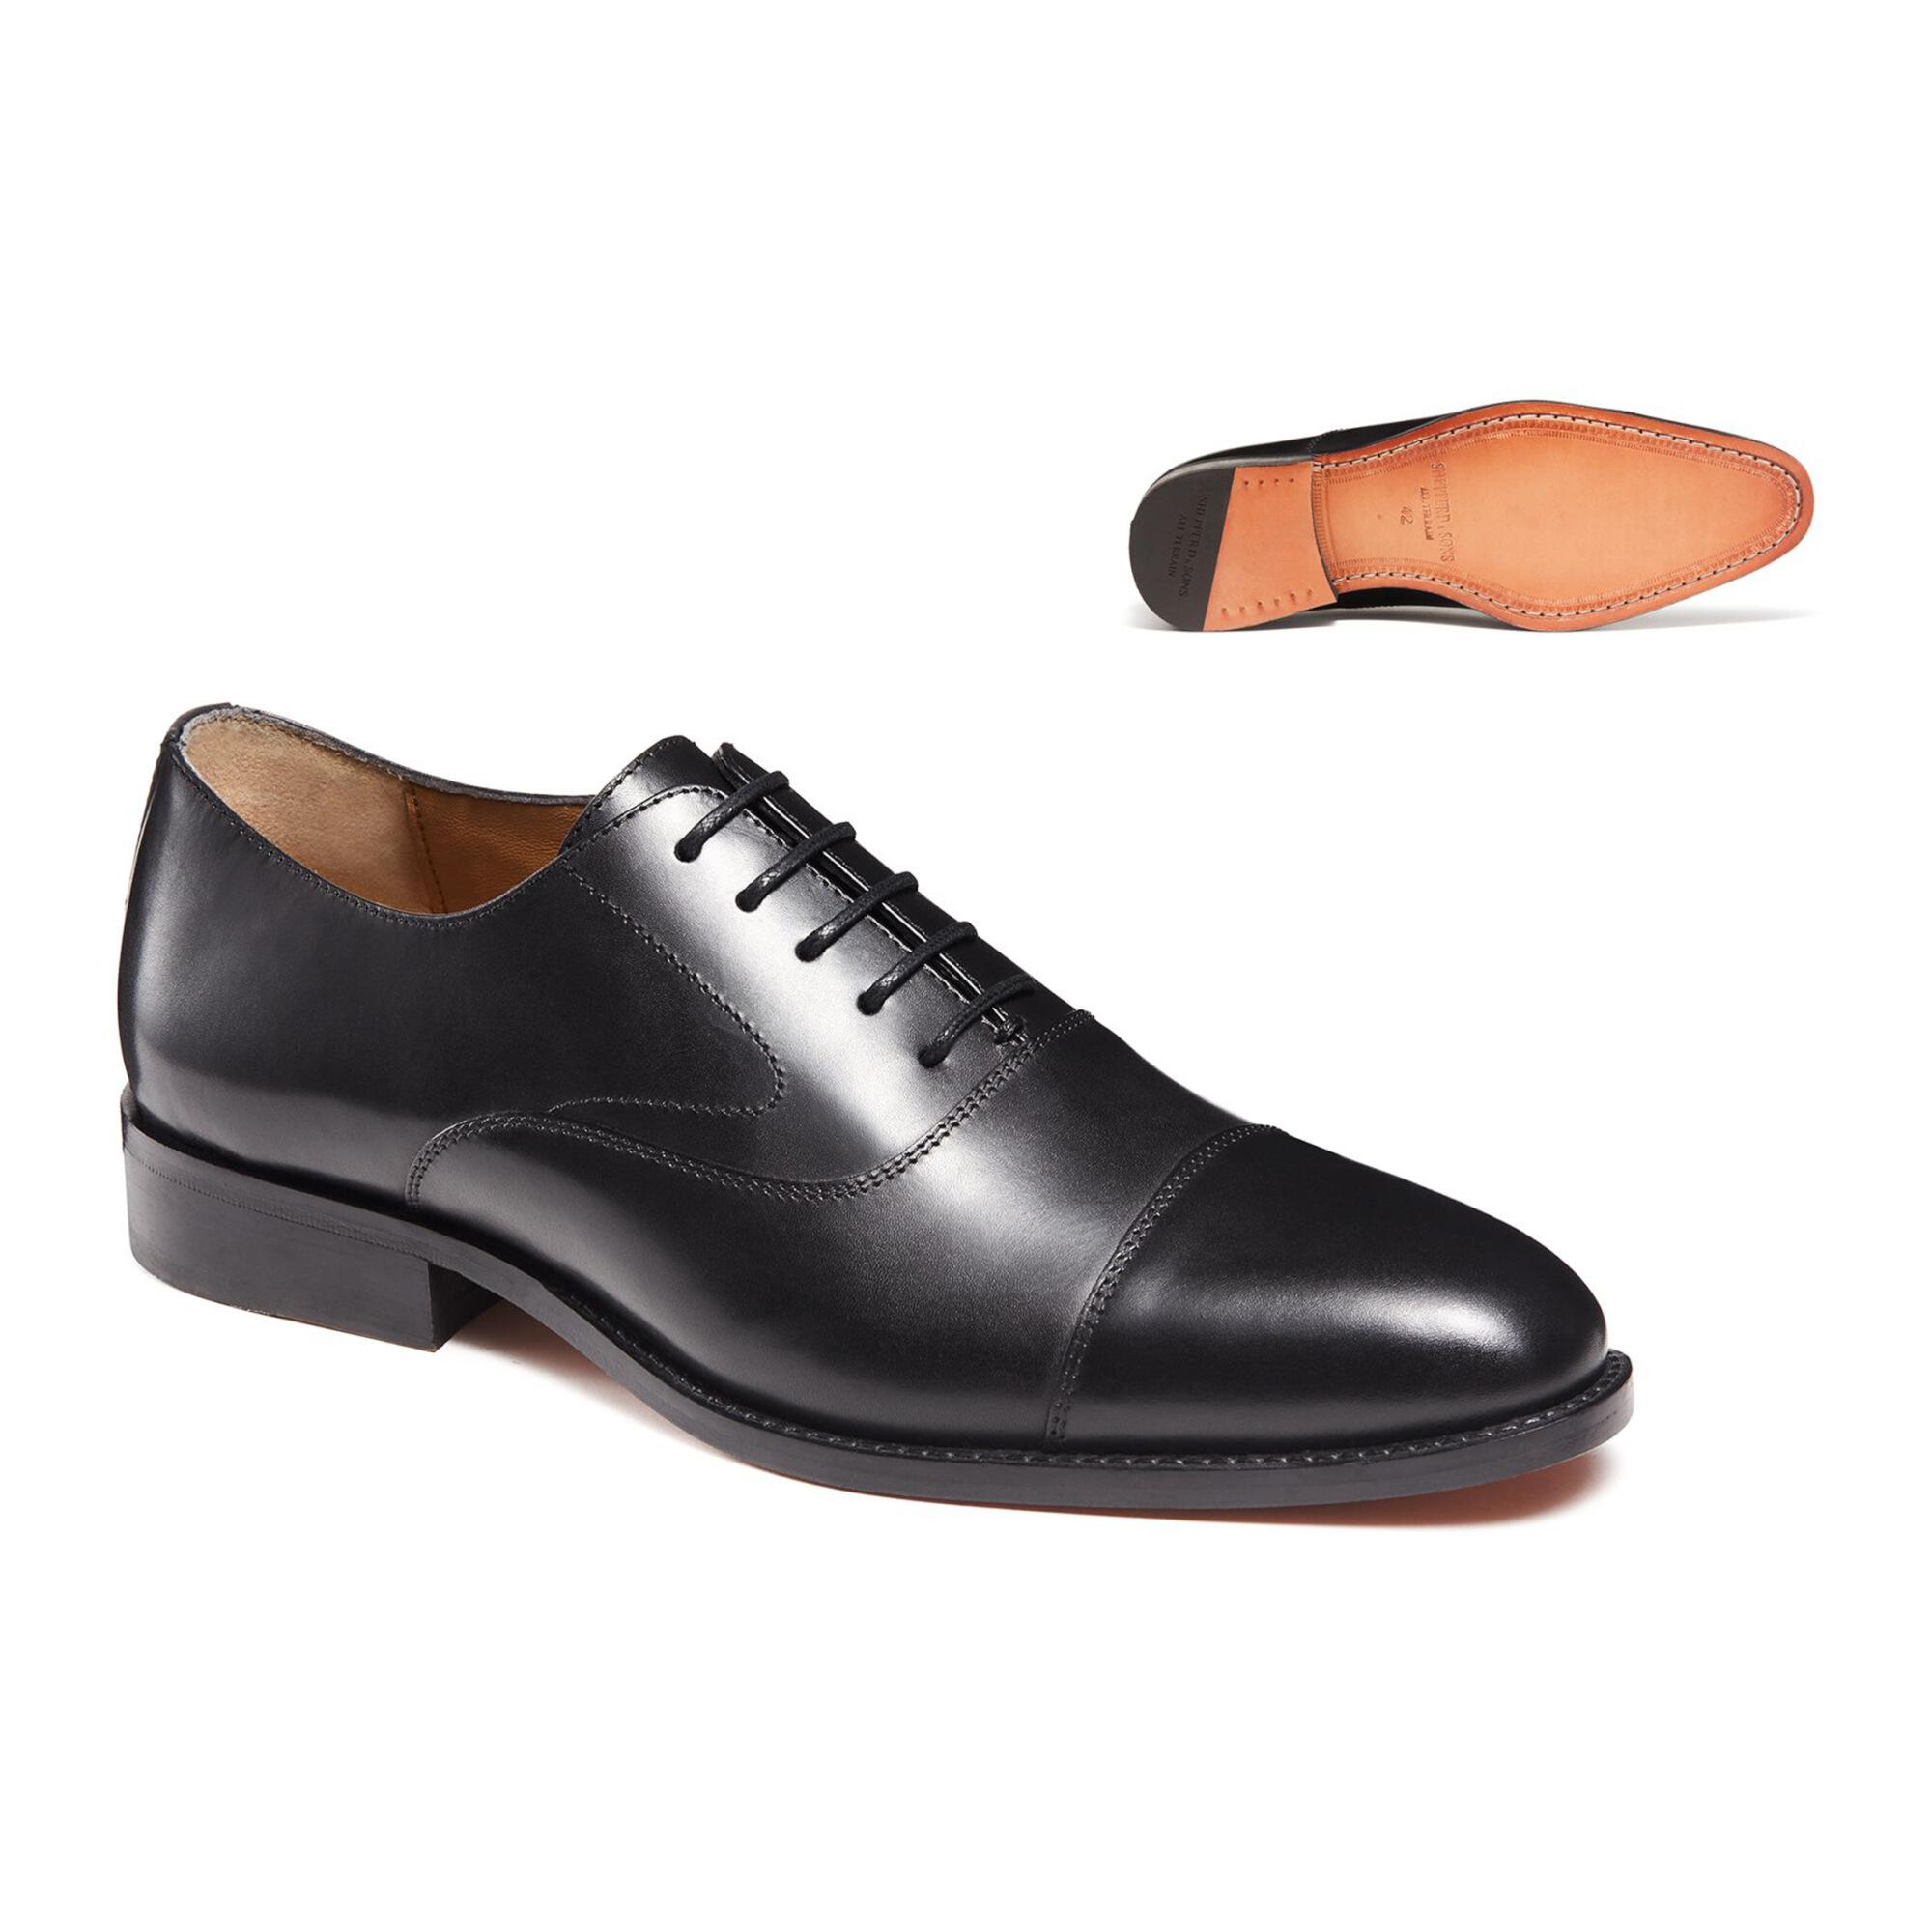 Chaussures Richelieus Shepperd & sons Georges - Taille au choix